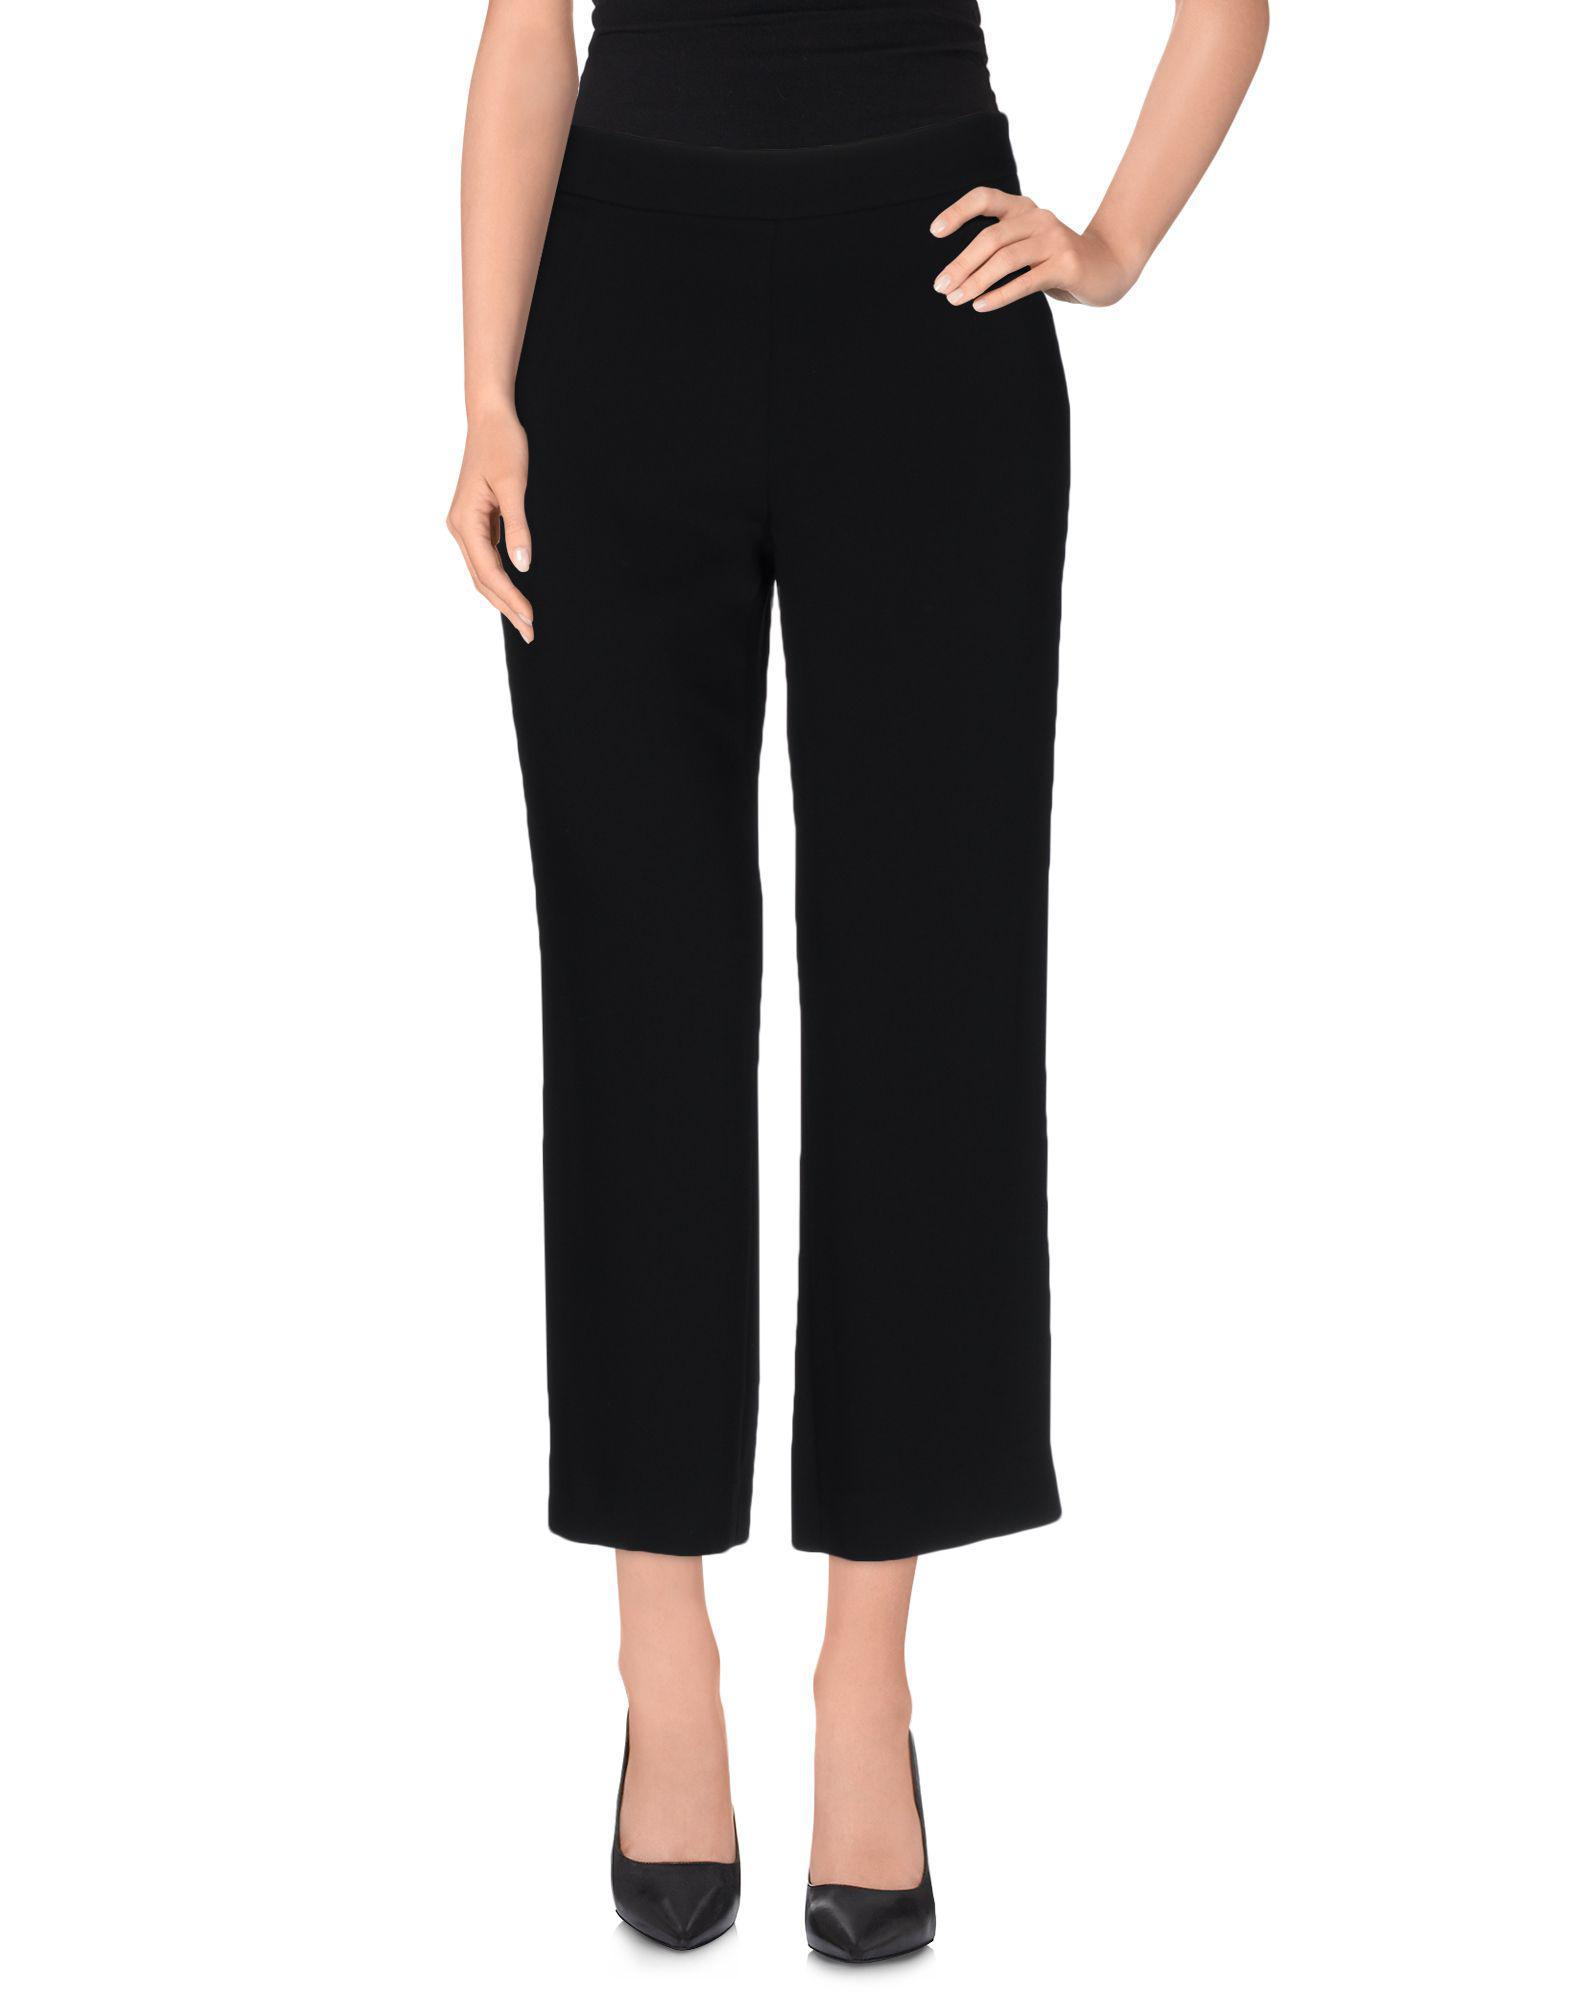 TROUSERS - 3/4-length trousers Piu & Piu 2GJoDaXk